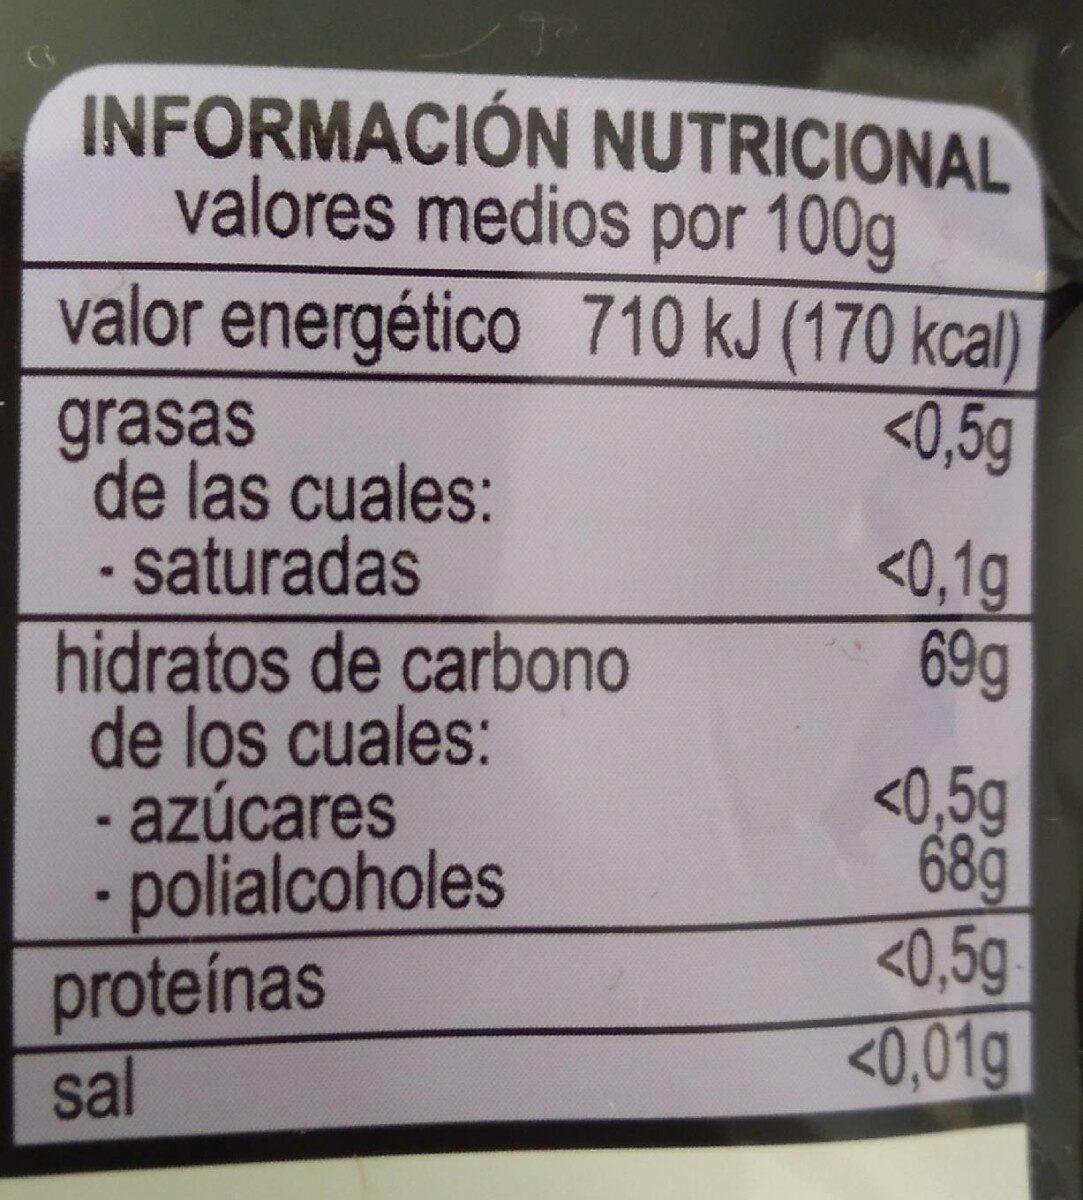 Chicles Regaliz/menta sin azúcar - Informations nutritionnelles - es